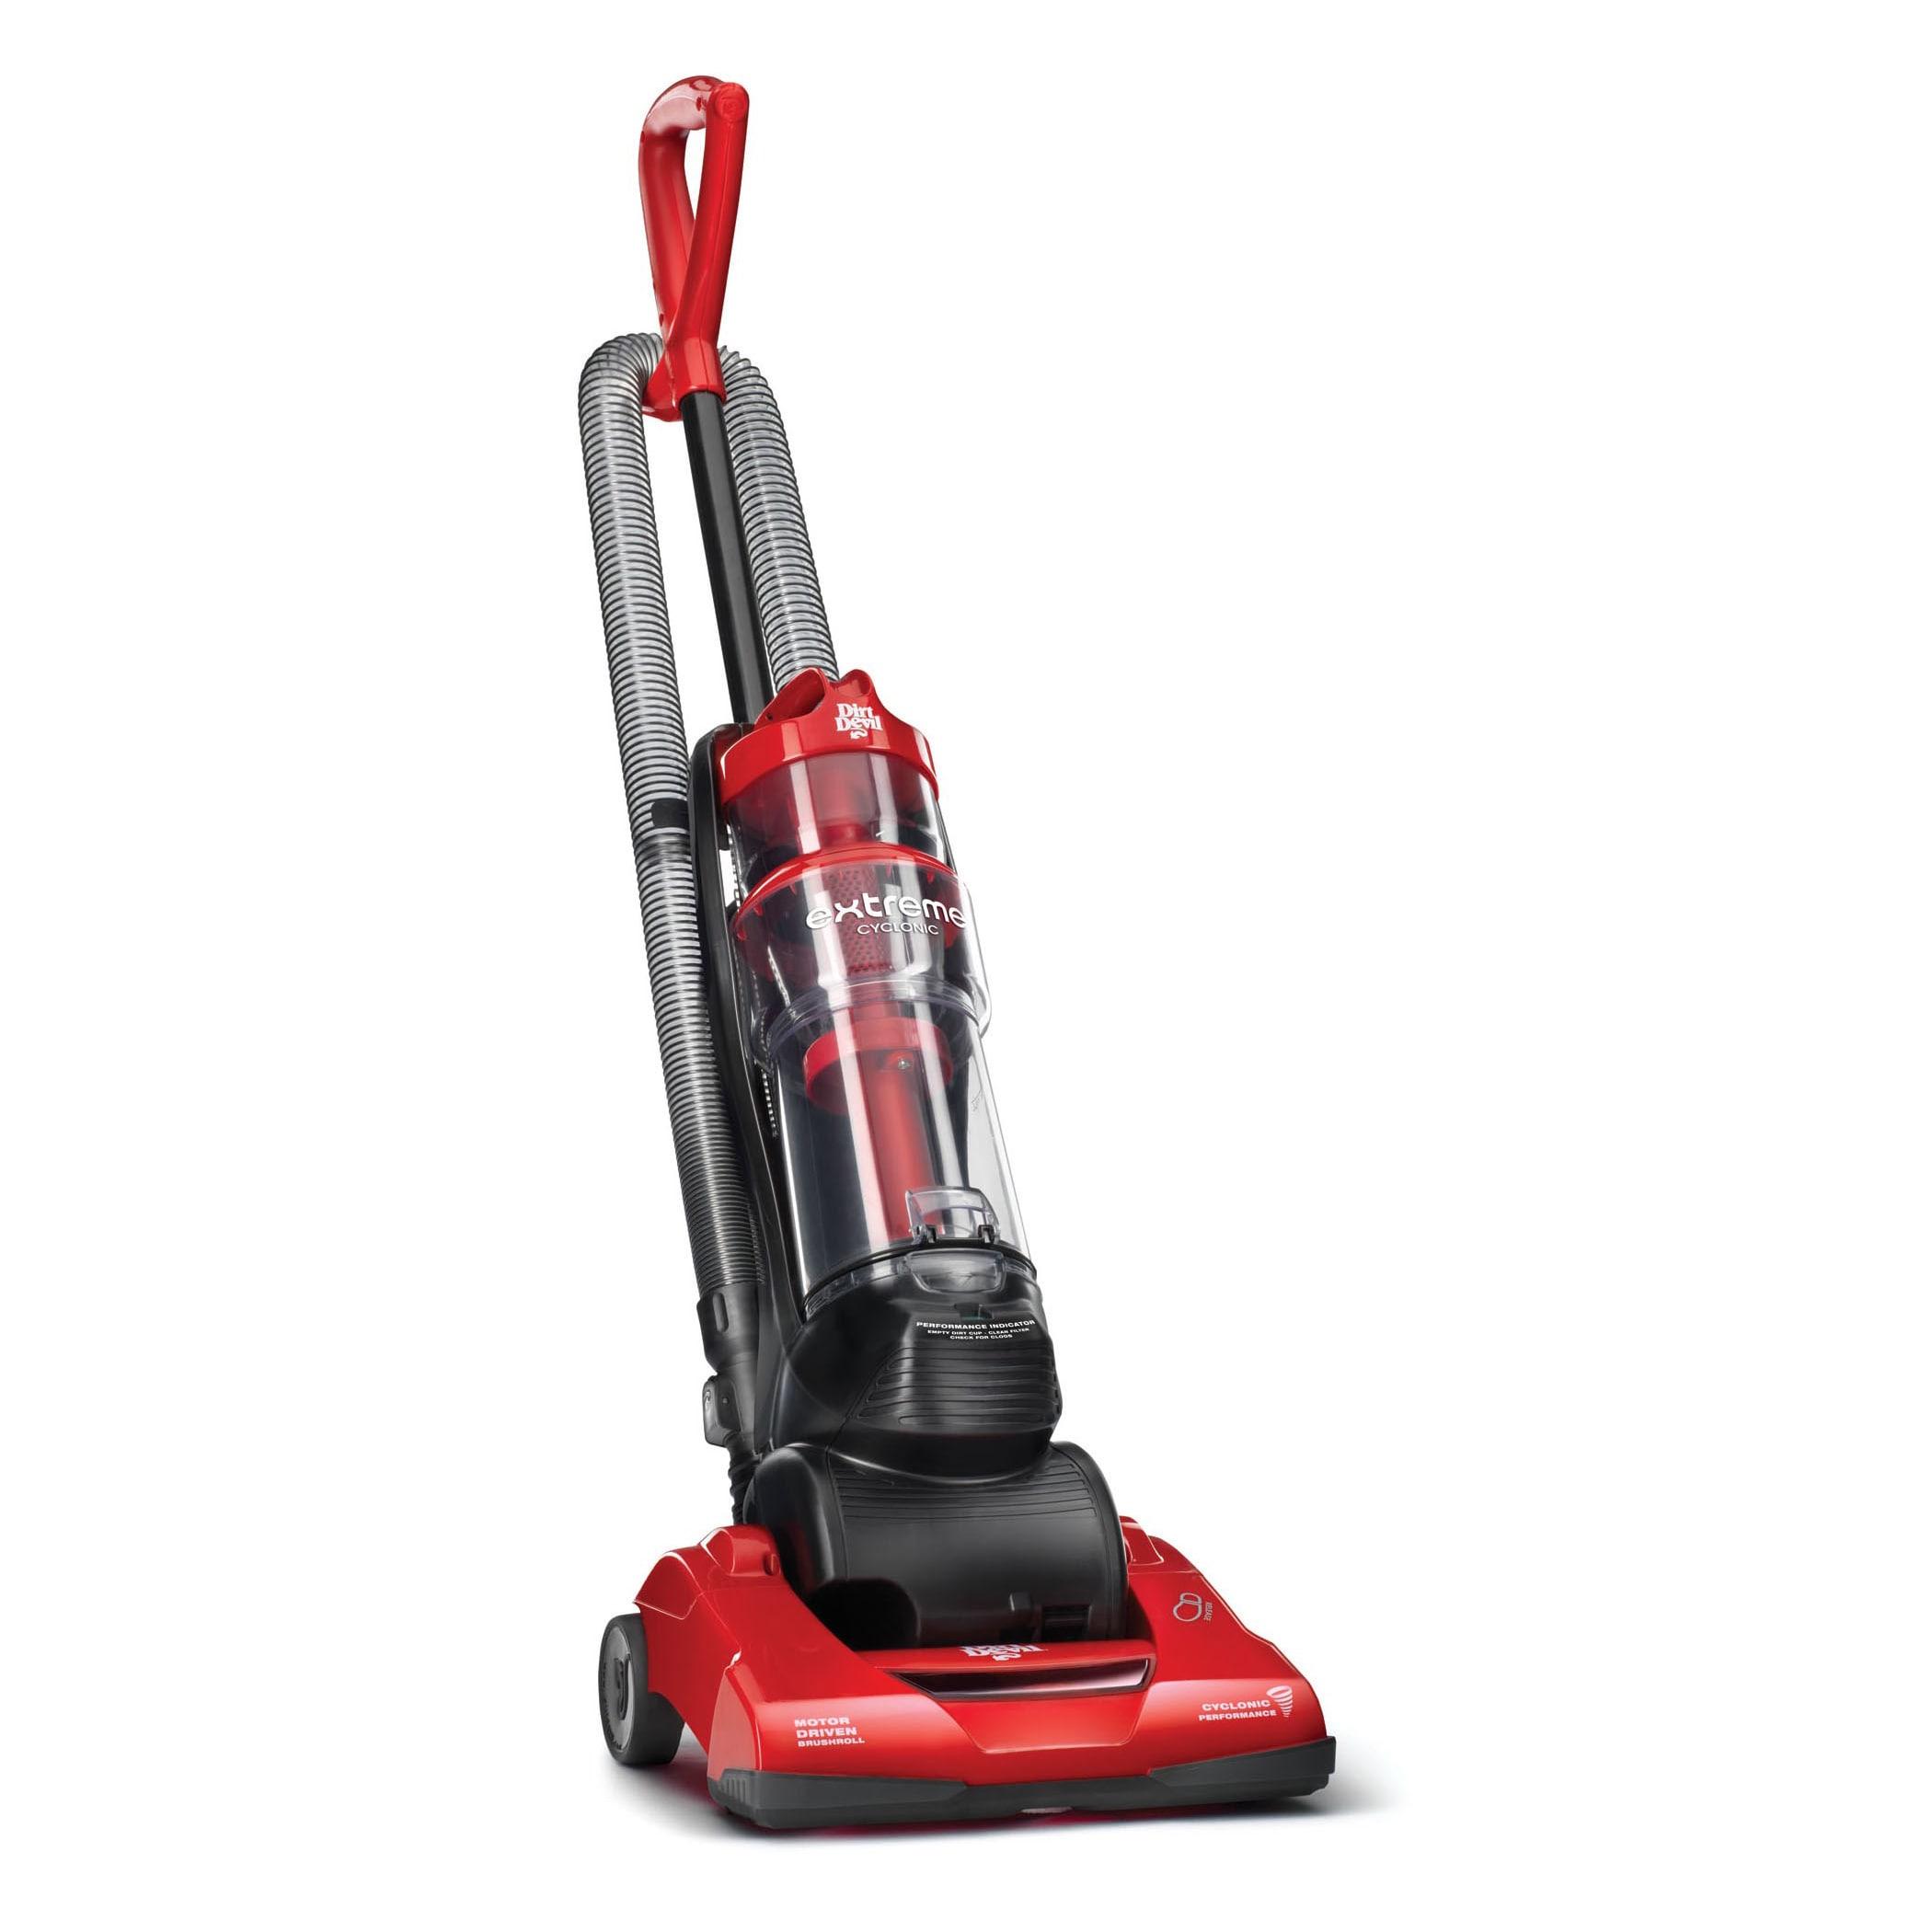 Dirt Devil UD20010 Extreme Cyclonic Upright Vacuum